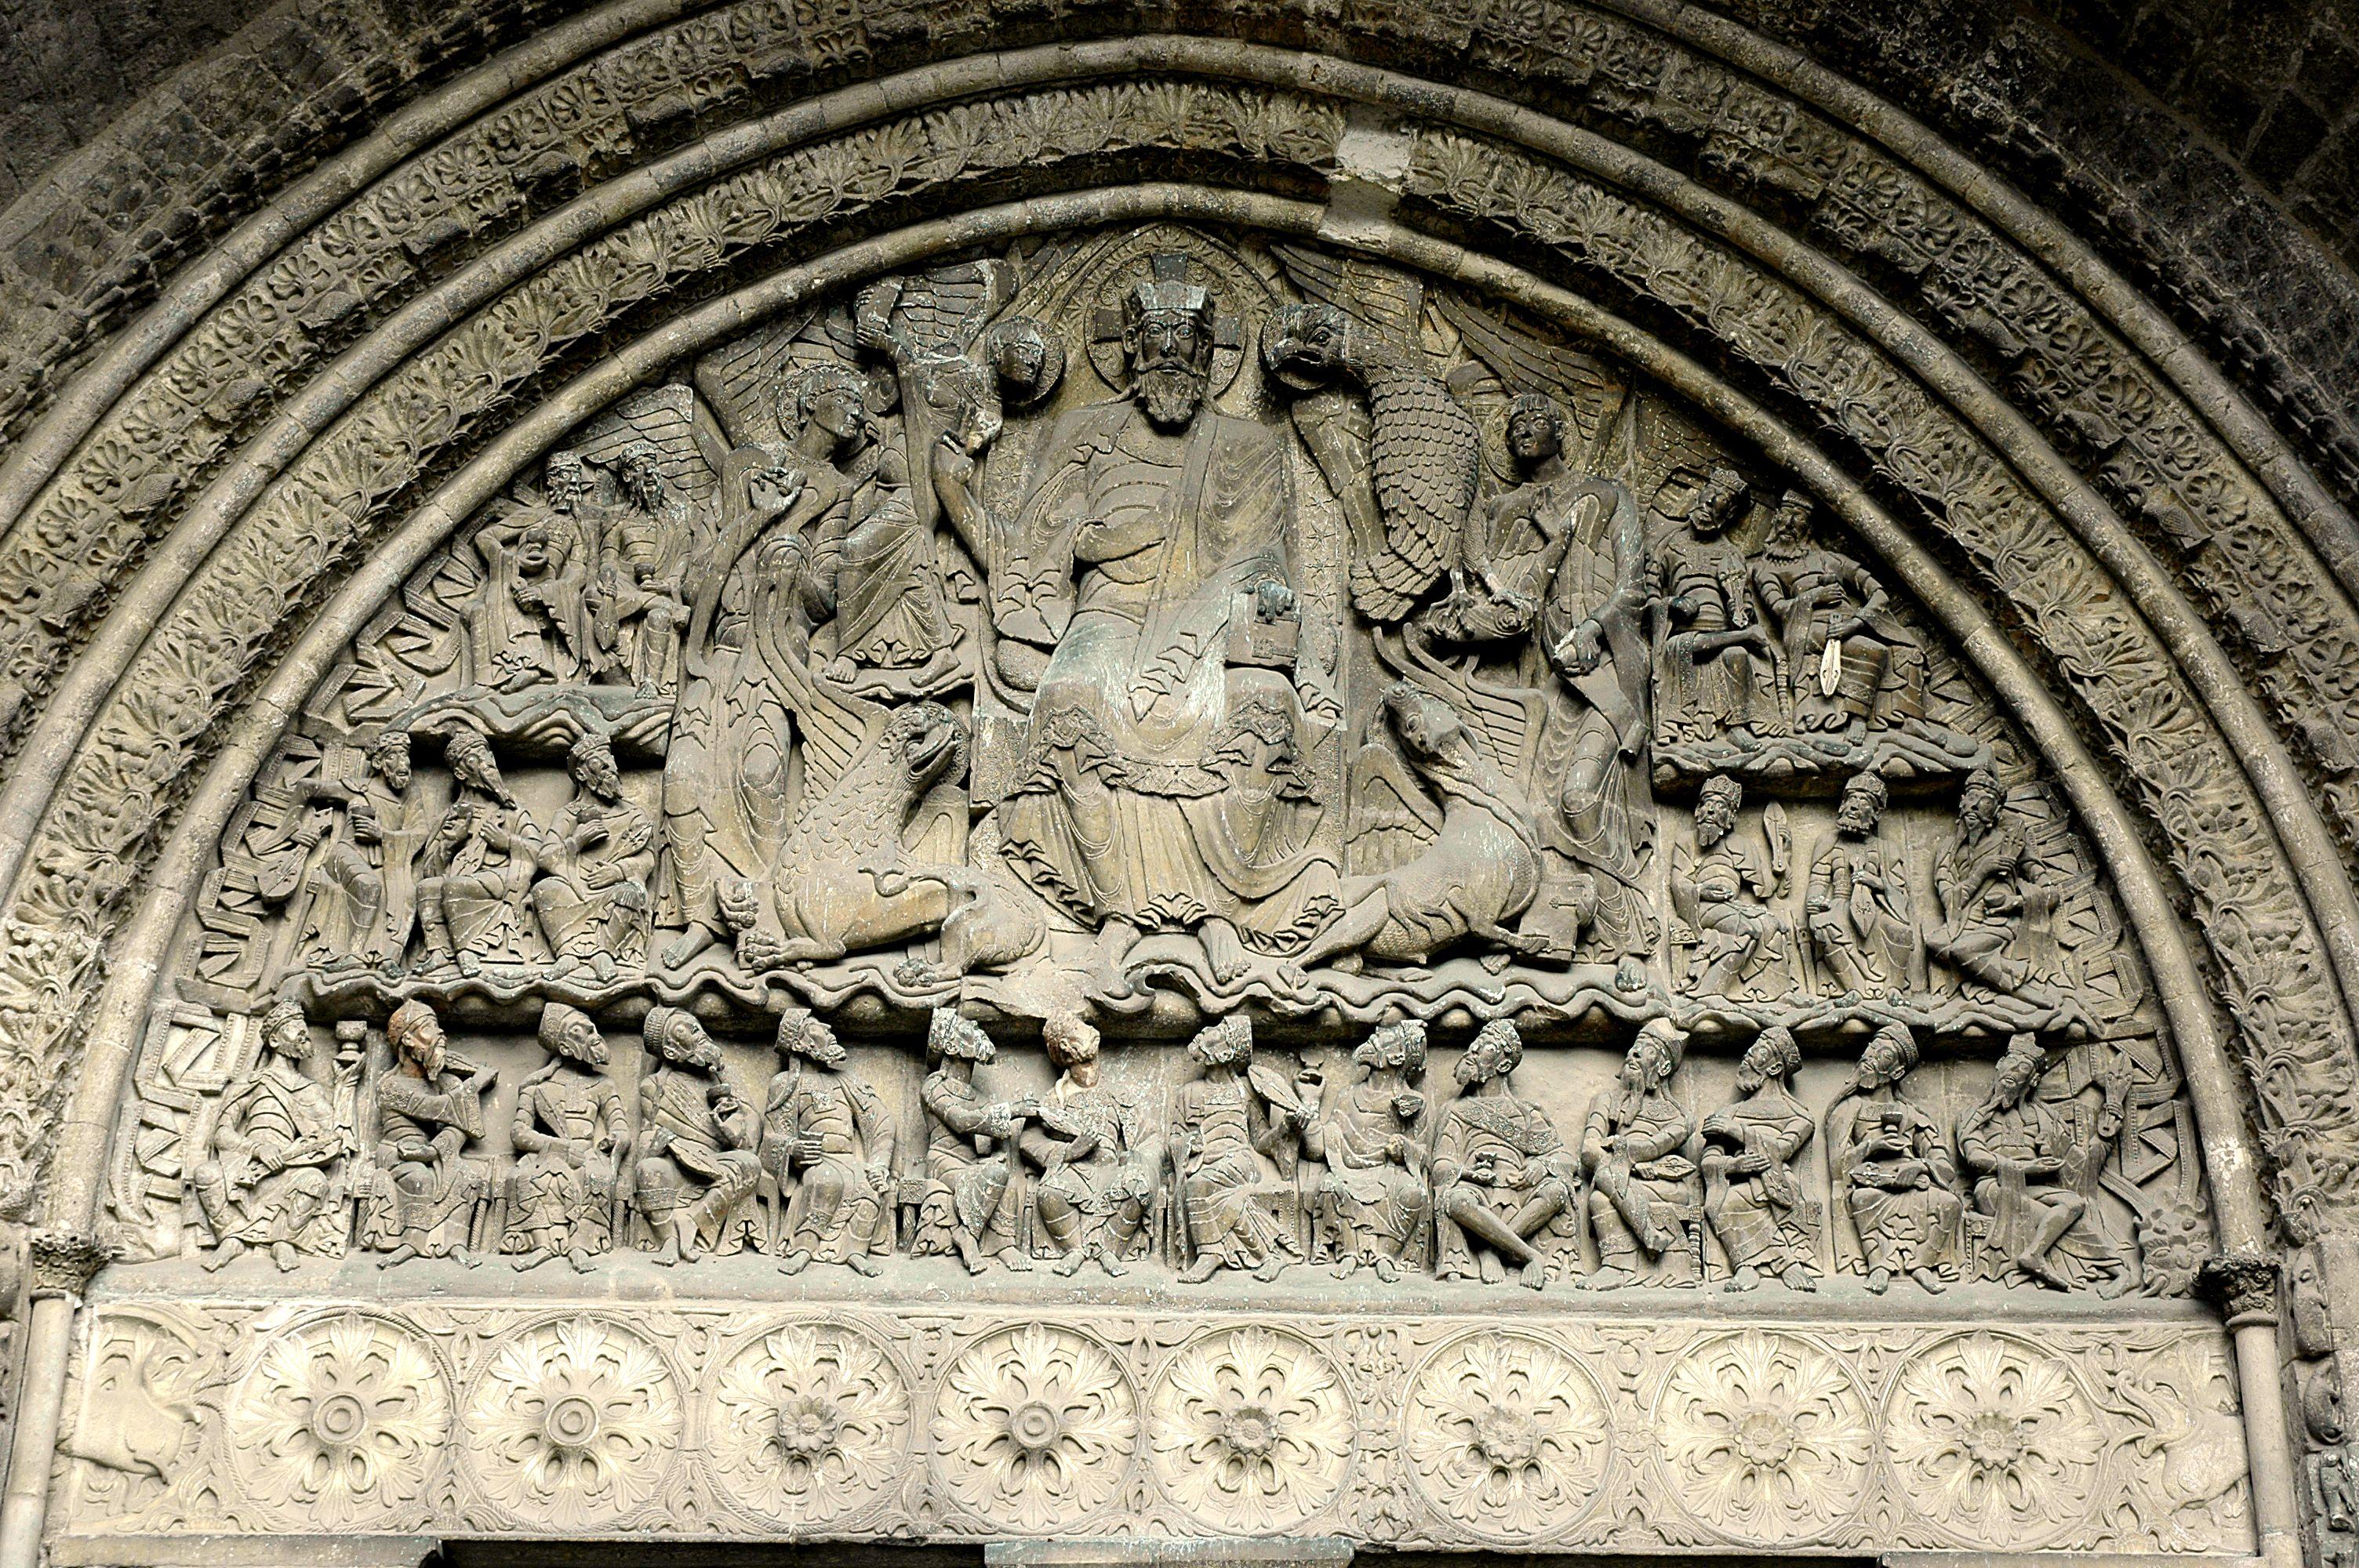 http://upload.wikimedia.org/wikipedia/commons/7/72/Abadia_de_Saint-Pierre_de_Moissac_-_Portalada_Sud_de_Moissac.JPG